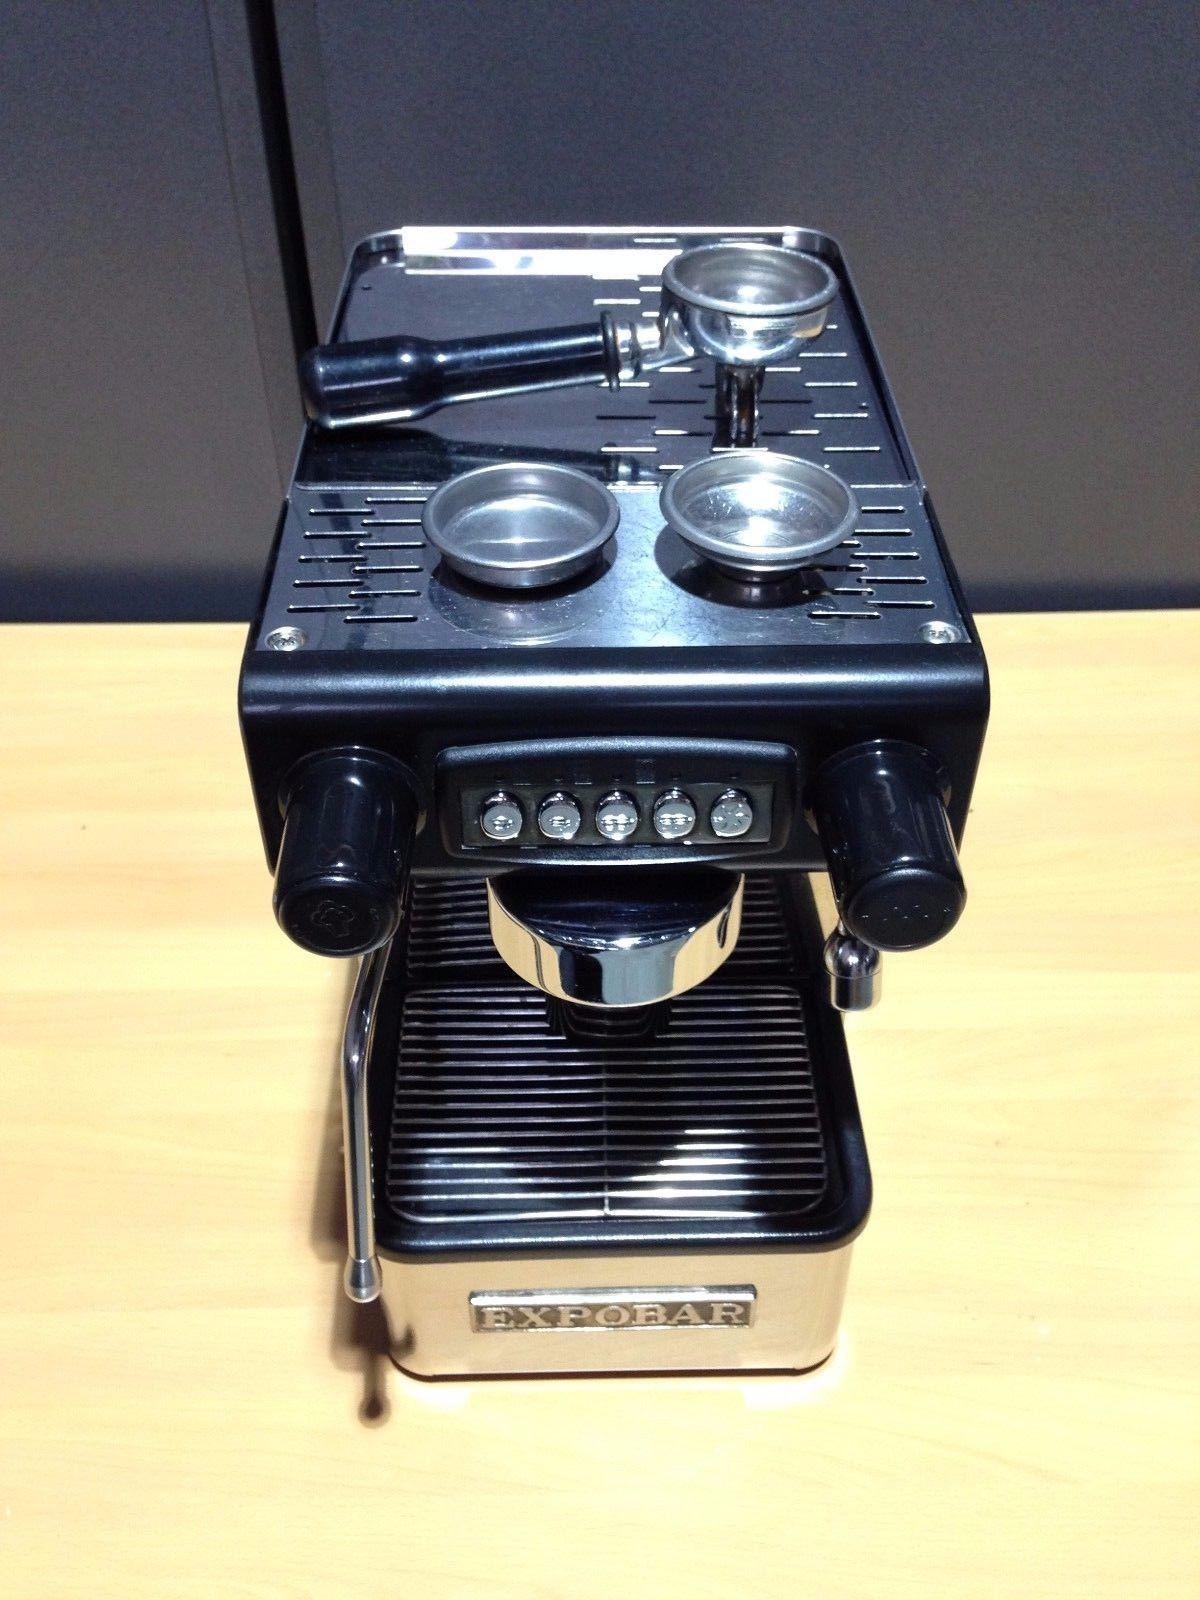 Expobar Office Control 1 Group Espresso Coffee Machine Cappuccino Maker